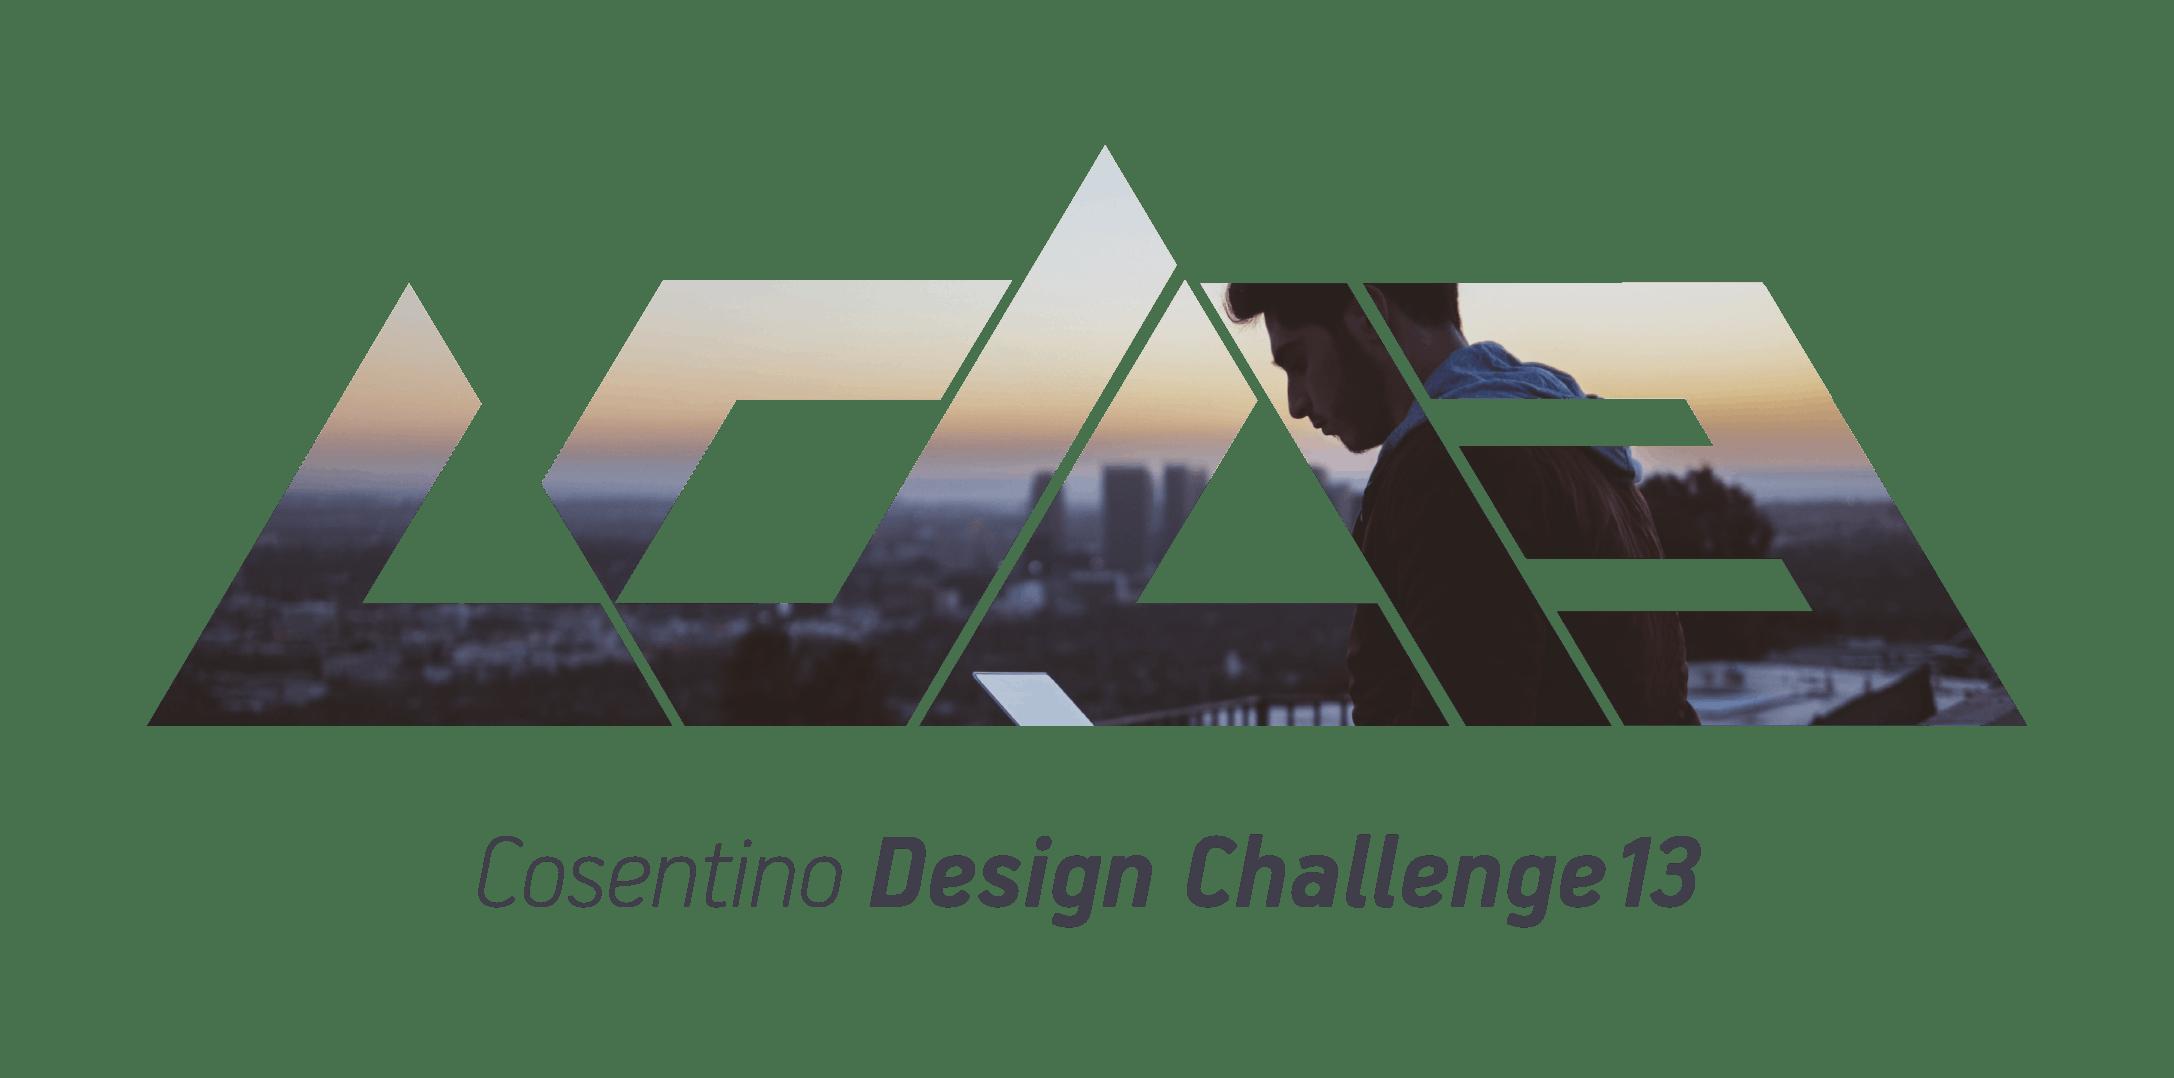 Image of logocd13 imagen 1 in Cosentino Design Challenge 13 - Cosentino